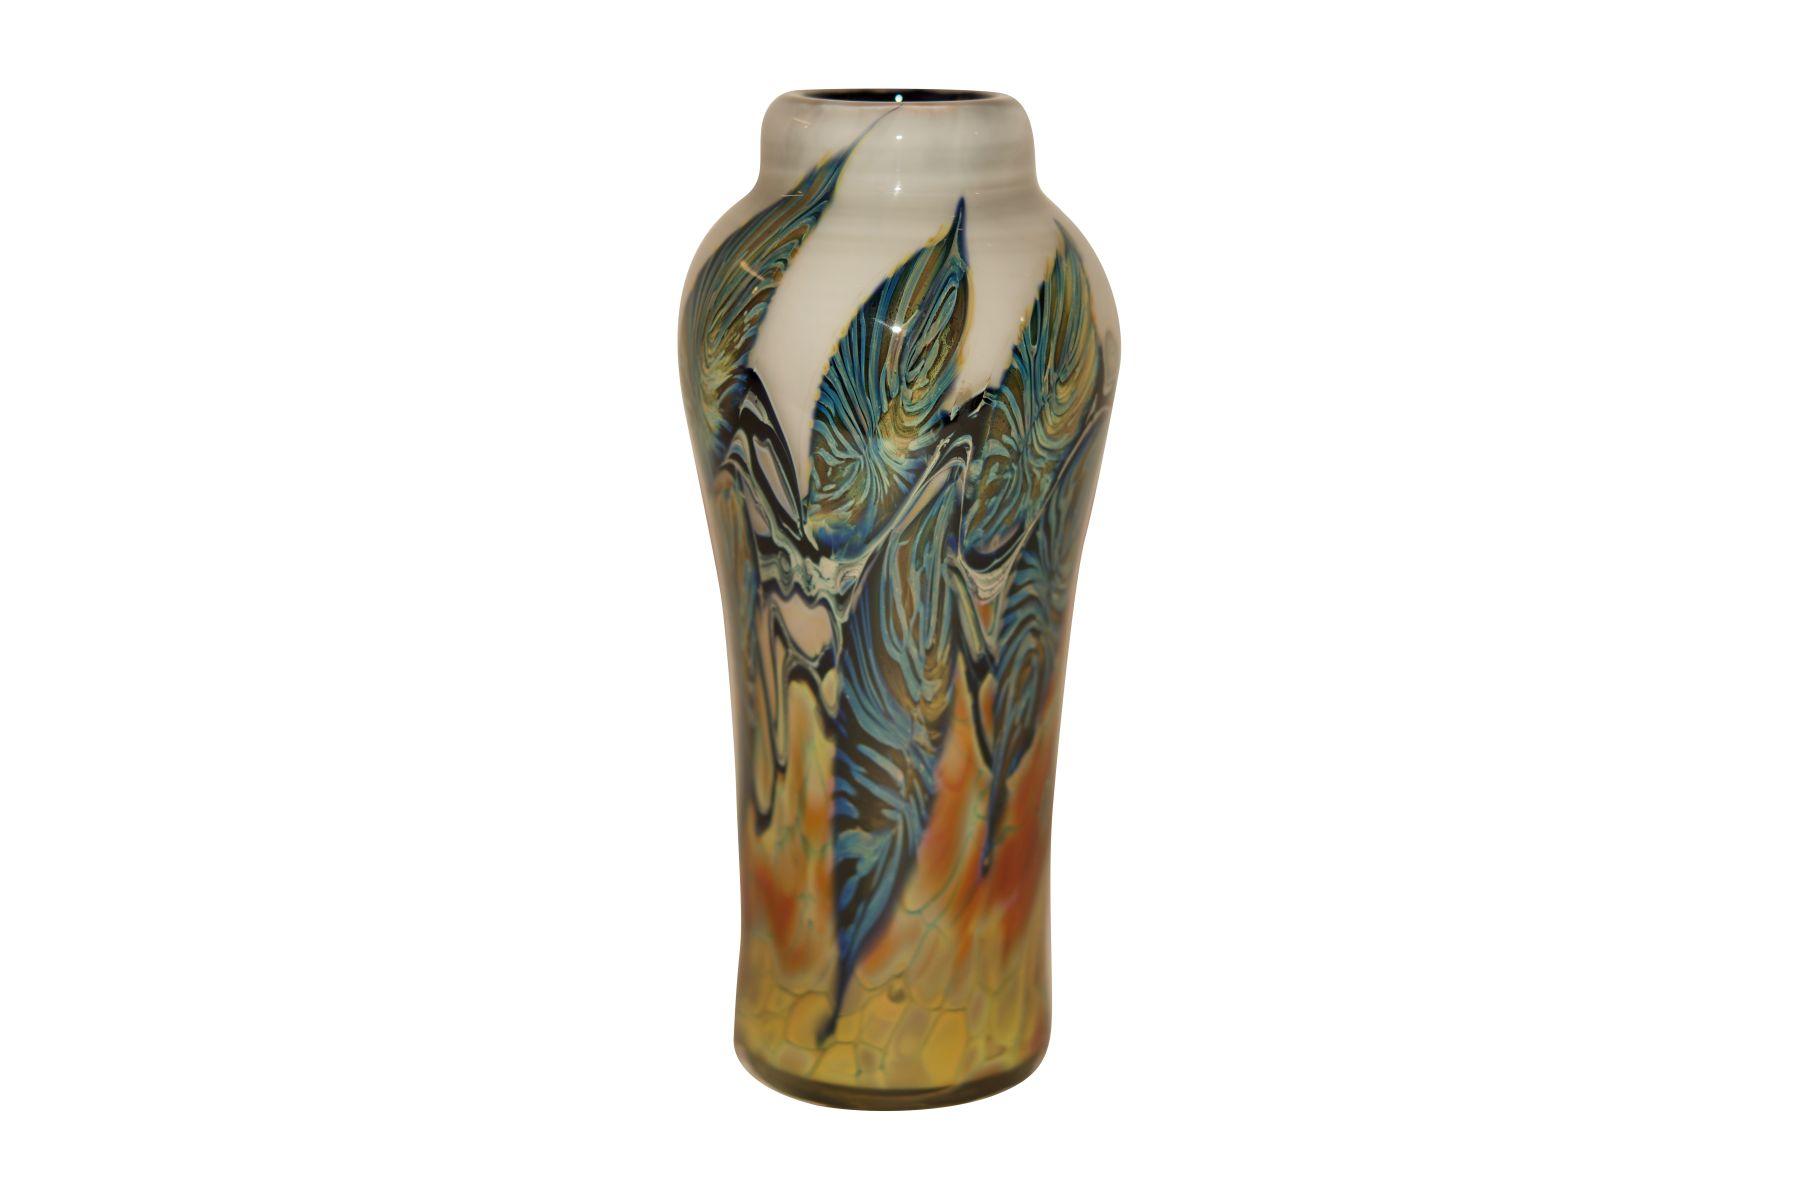 #172 Rare vase | Seltene Vase Image